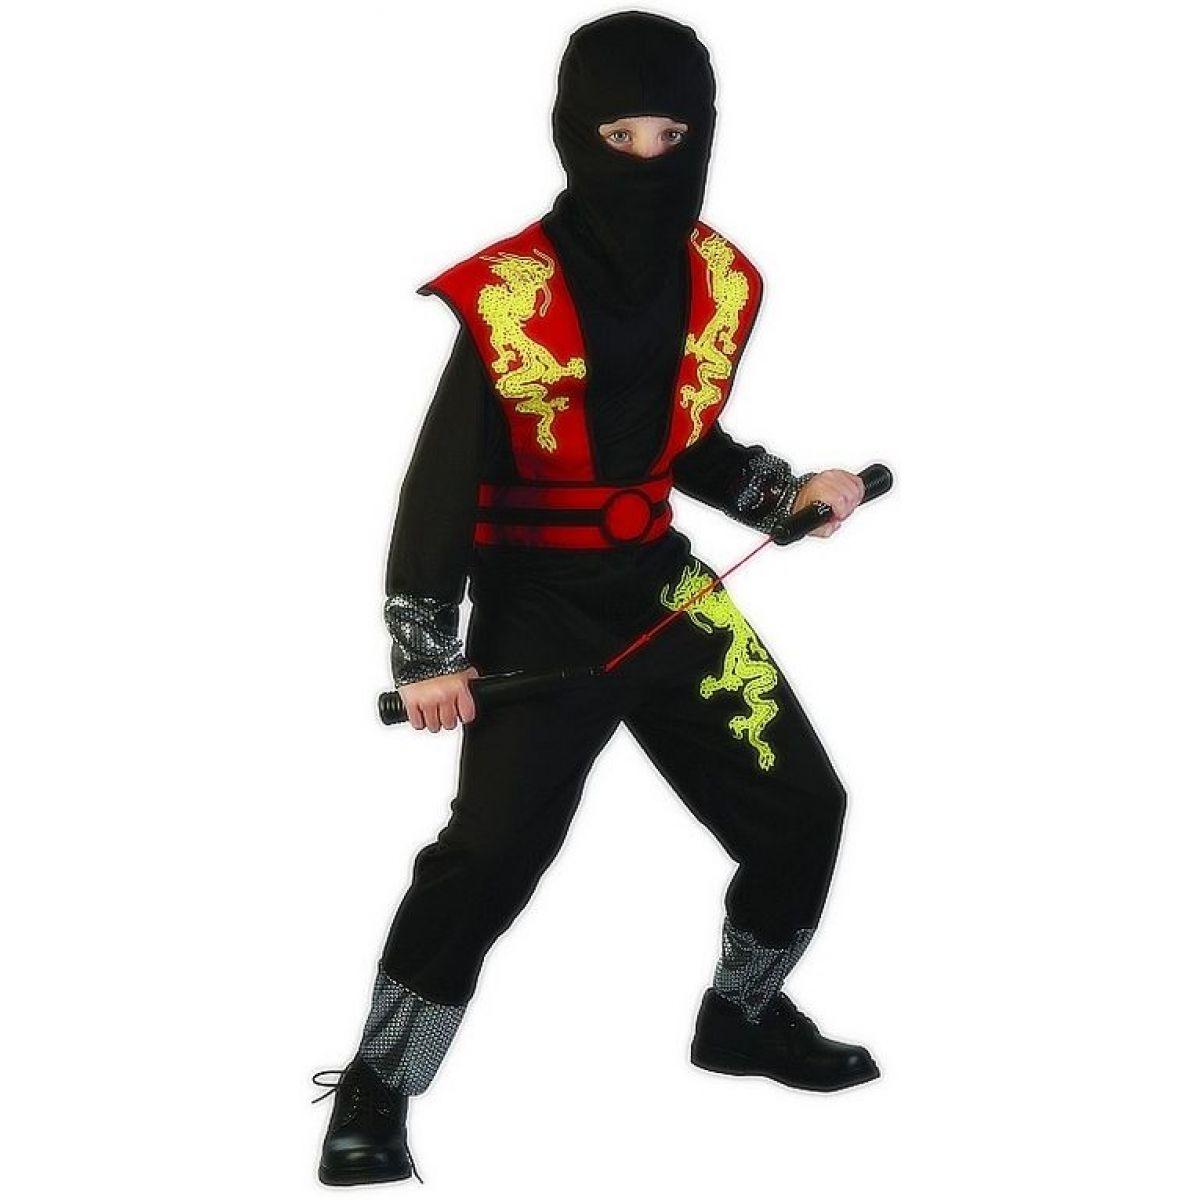 Made Dětský kostým Ninja červený 120-130cm